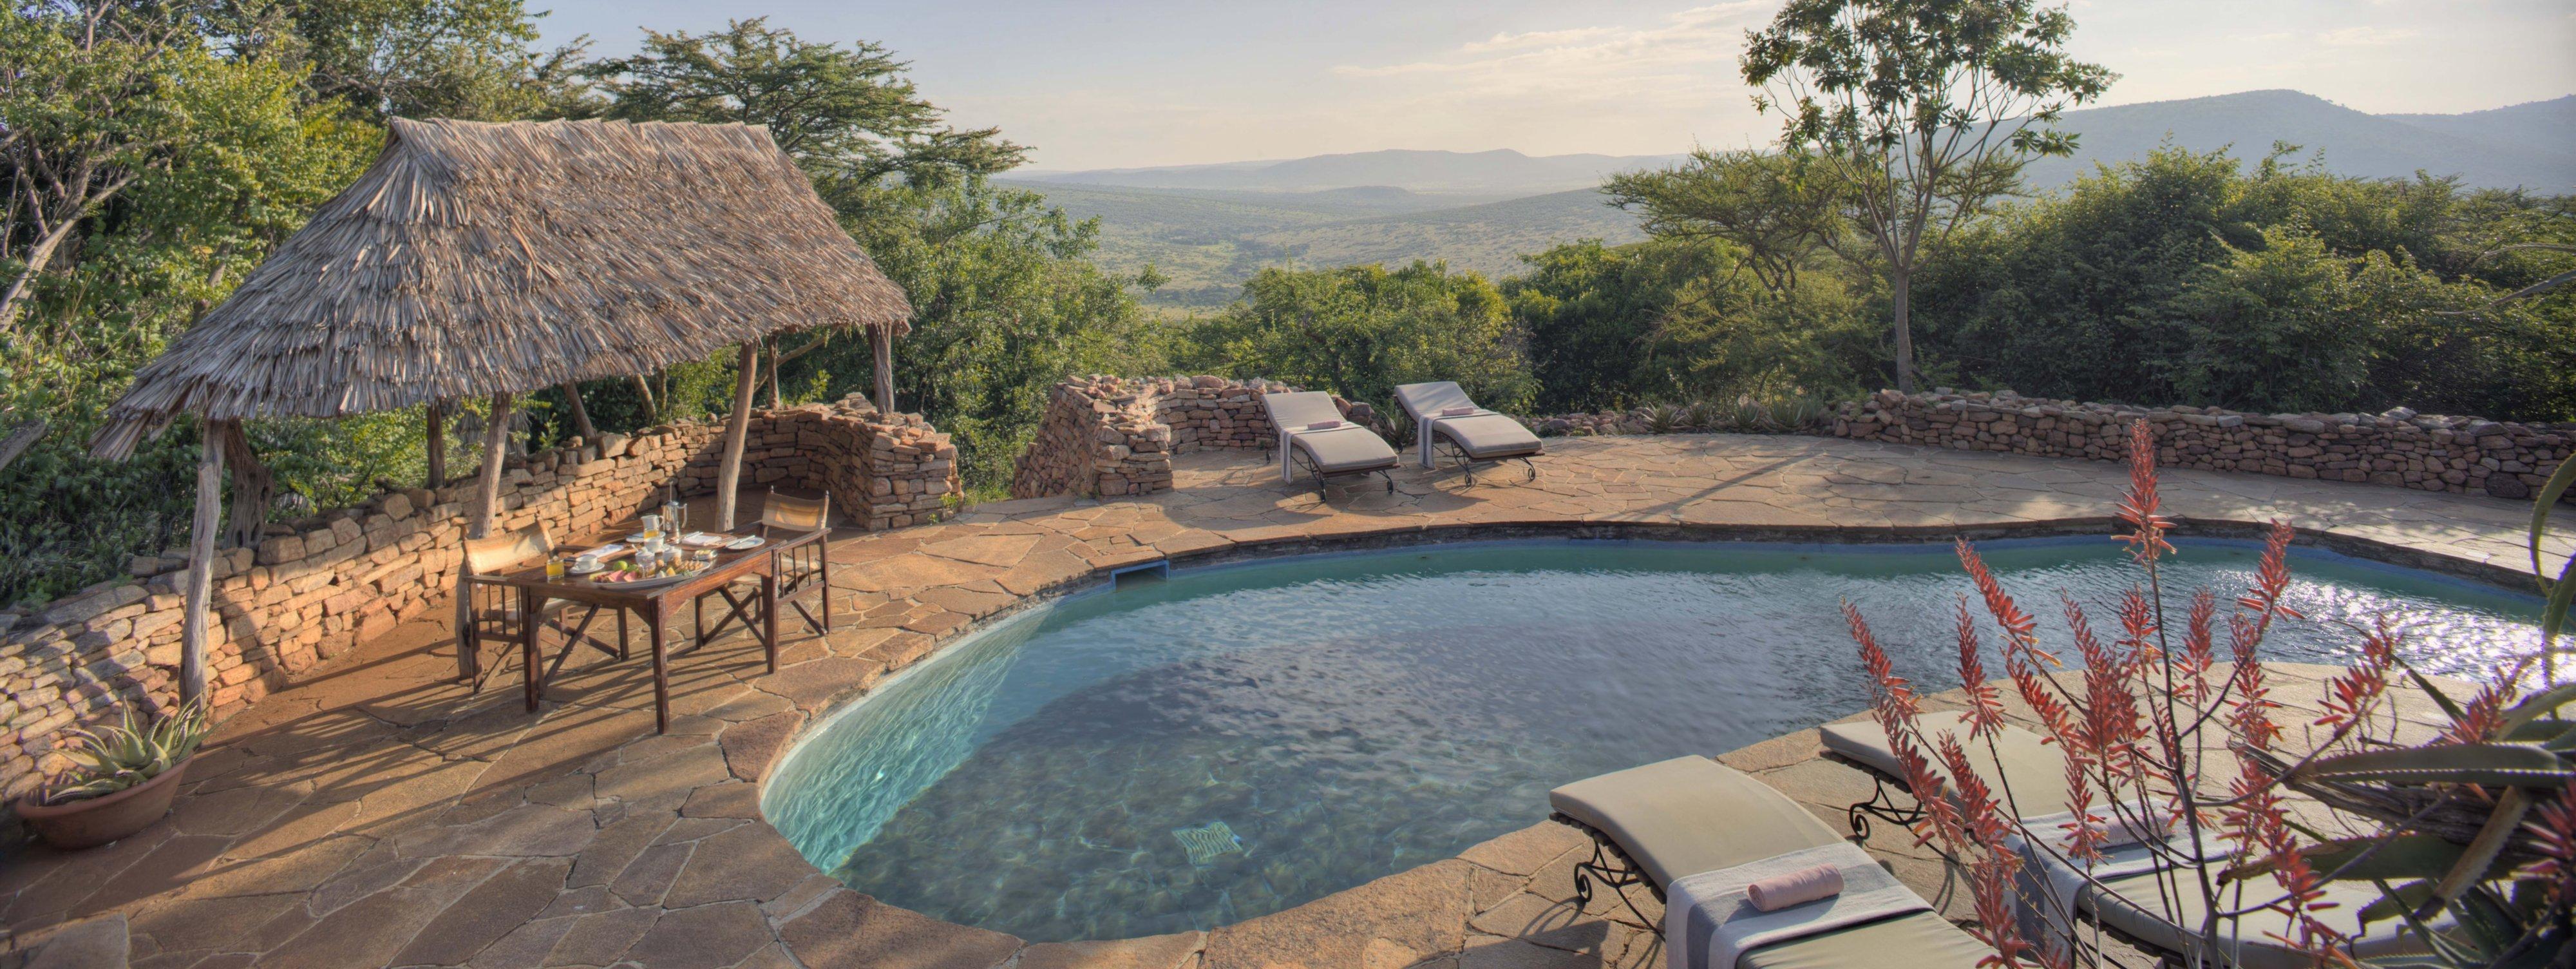 kleins-camp-serengeti-tanzania